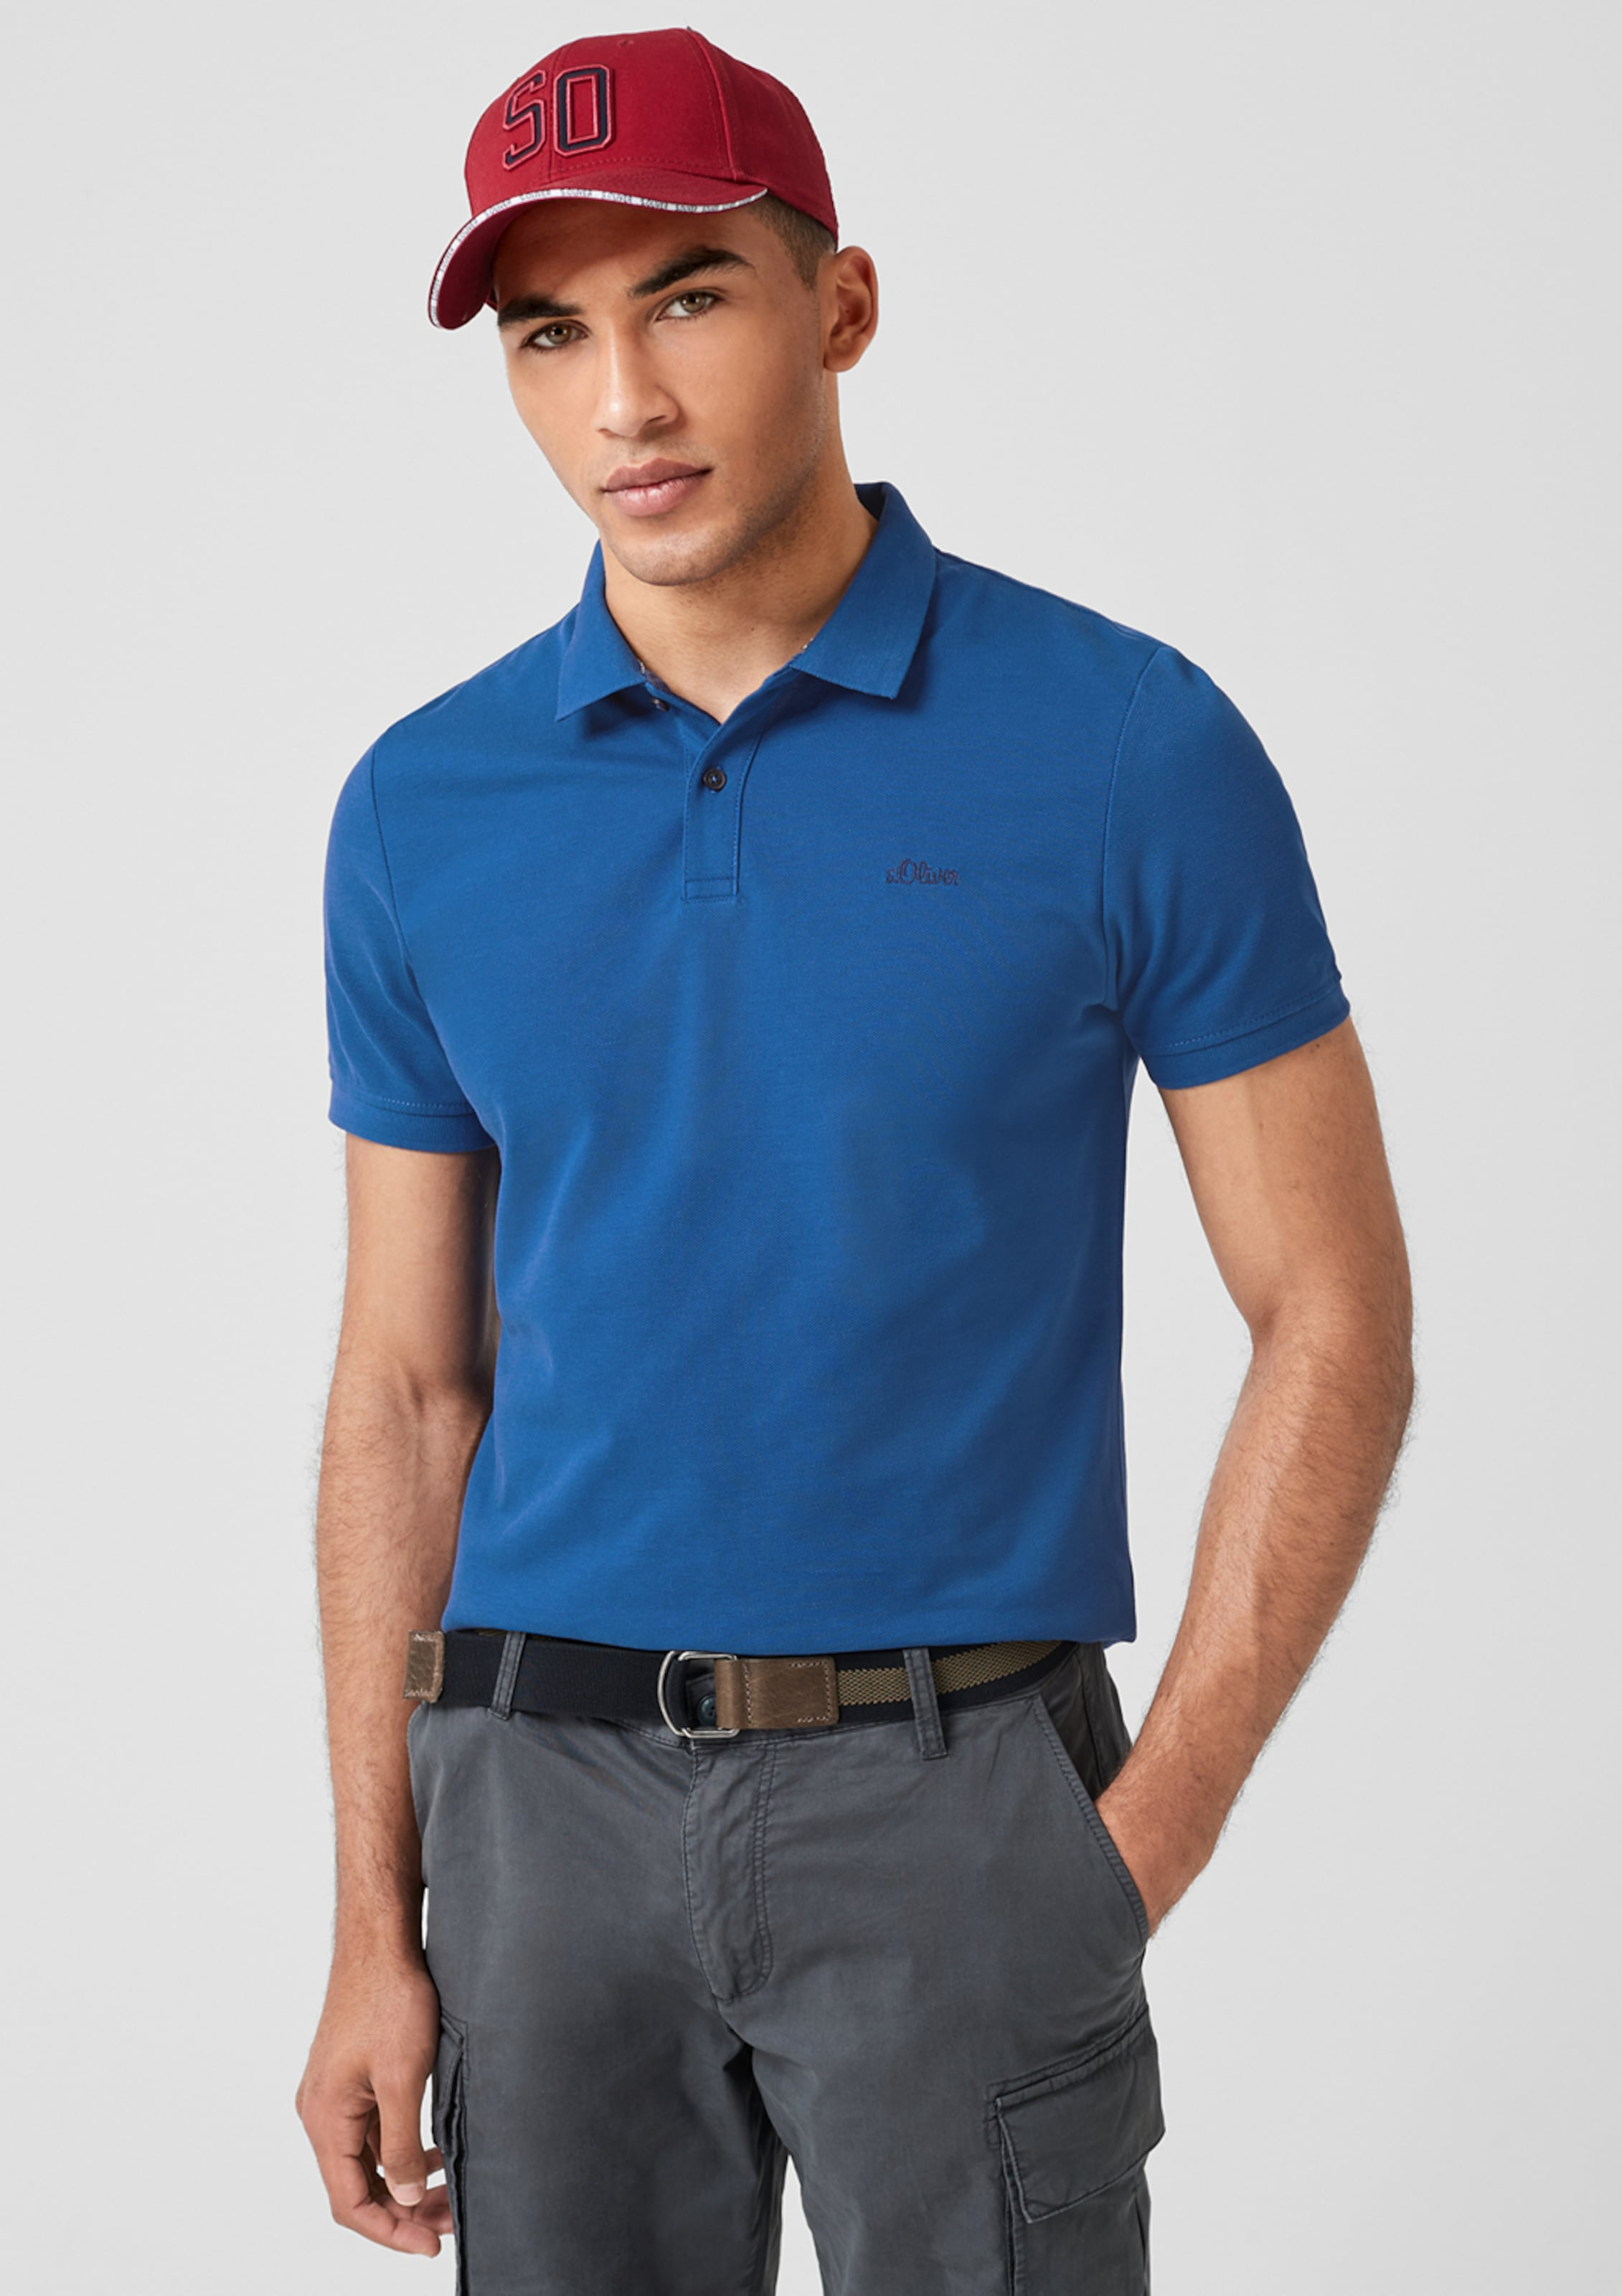 Blau Red Label oliver In S Poloshirt fb7ymI6gYv